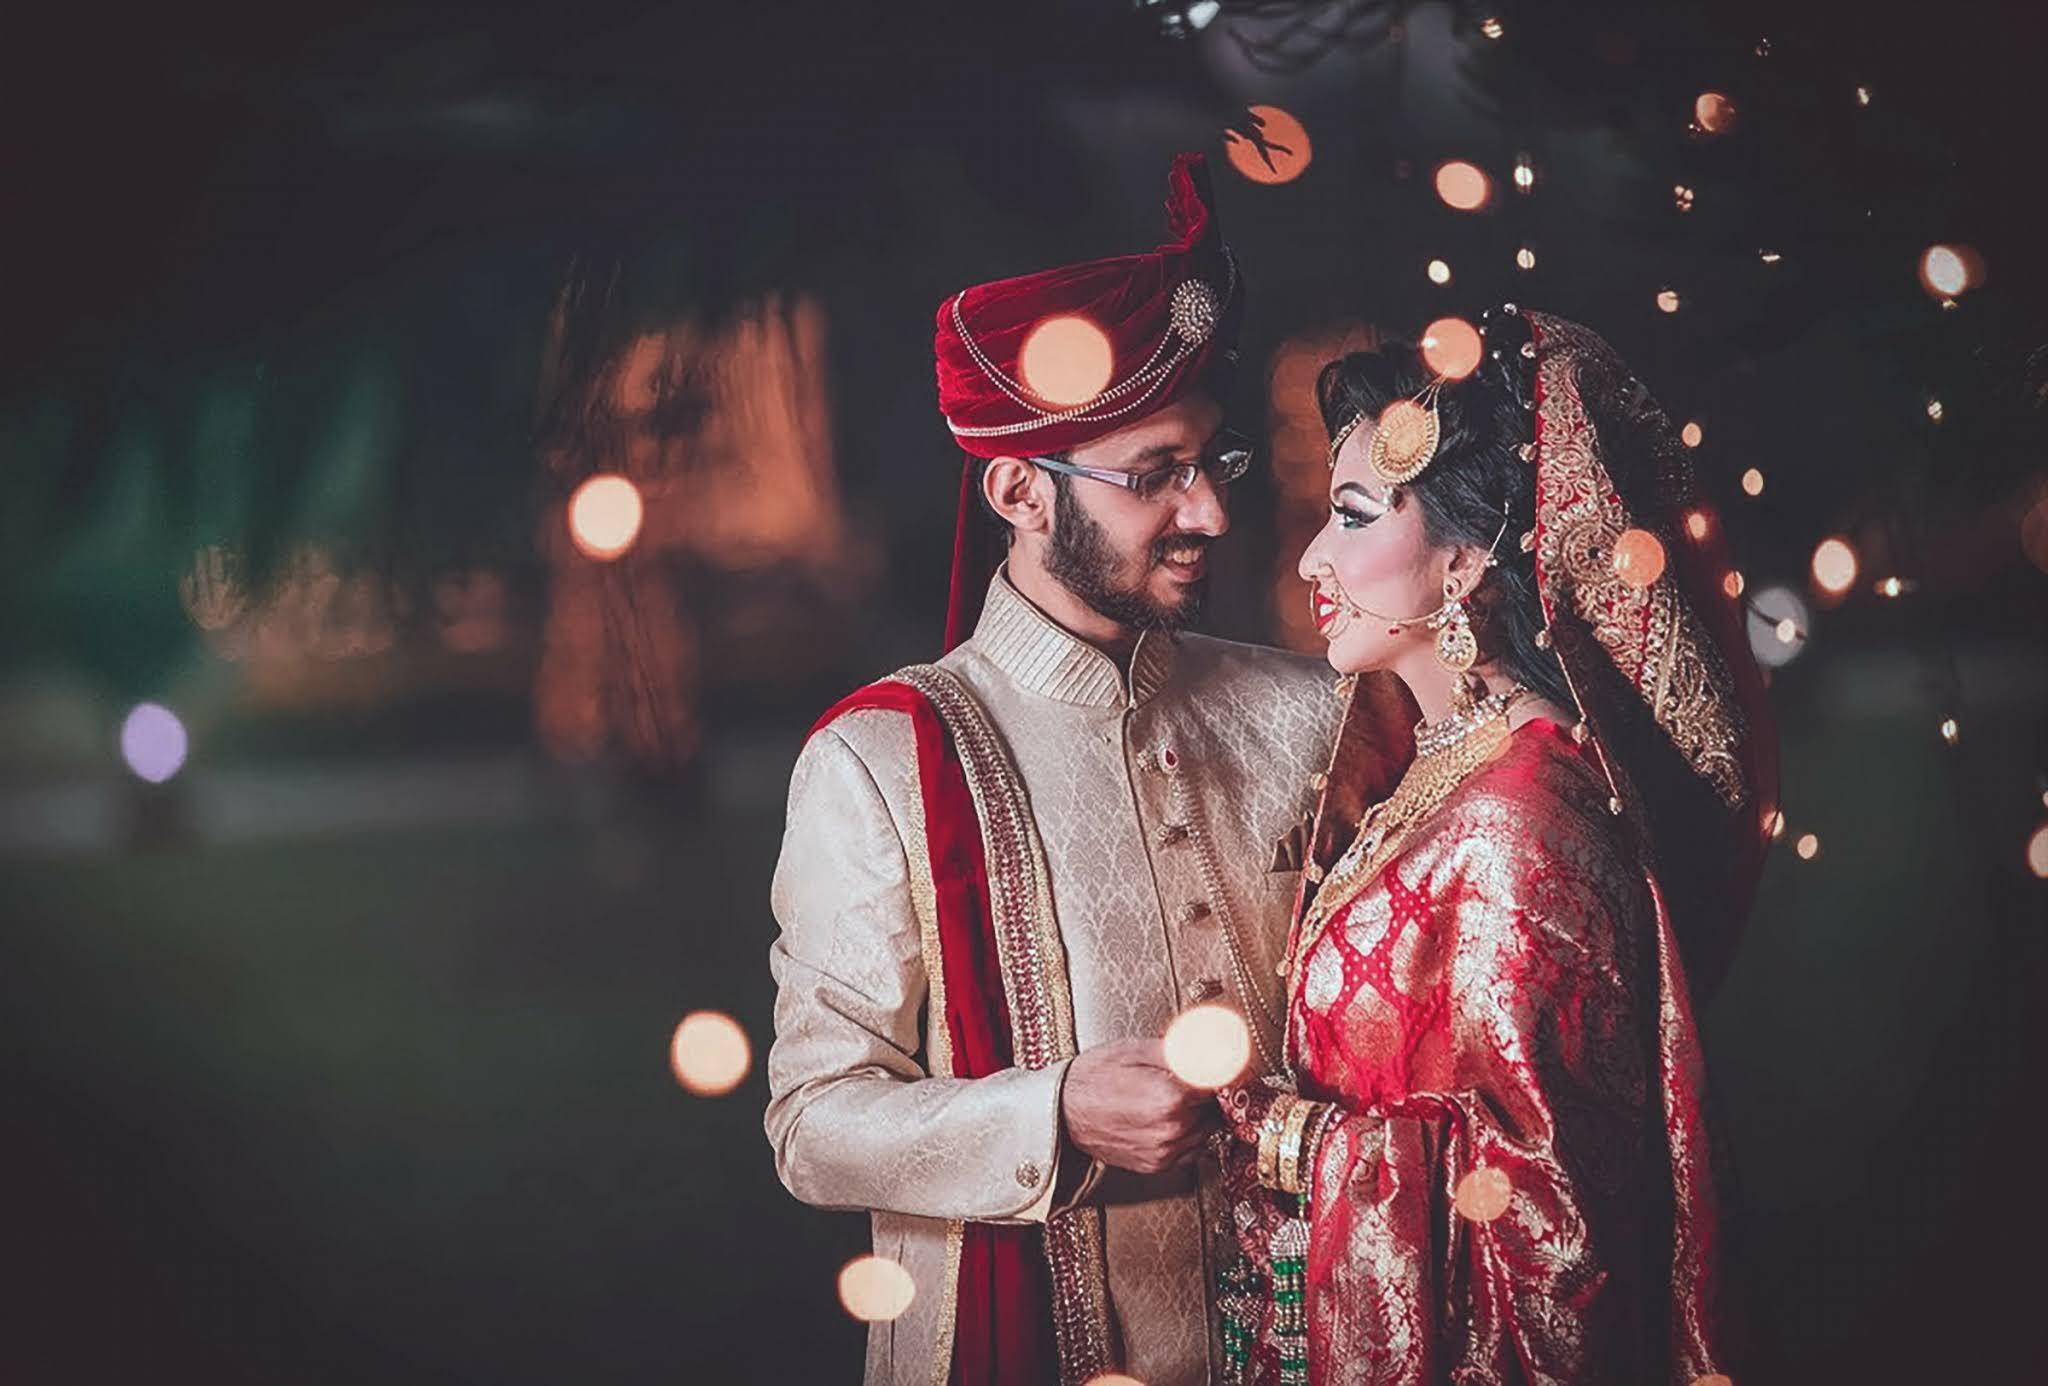 wedding effects photoshop action